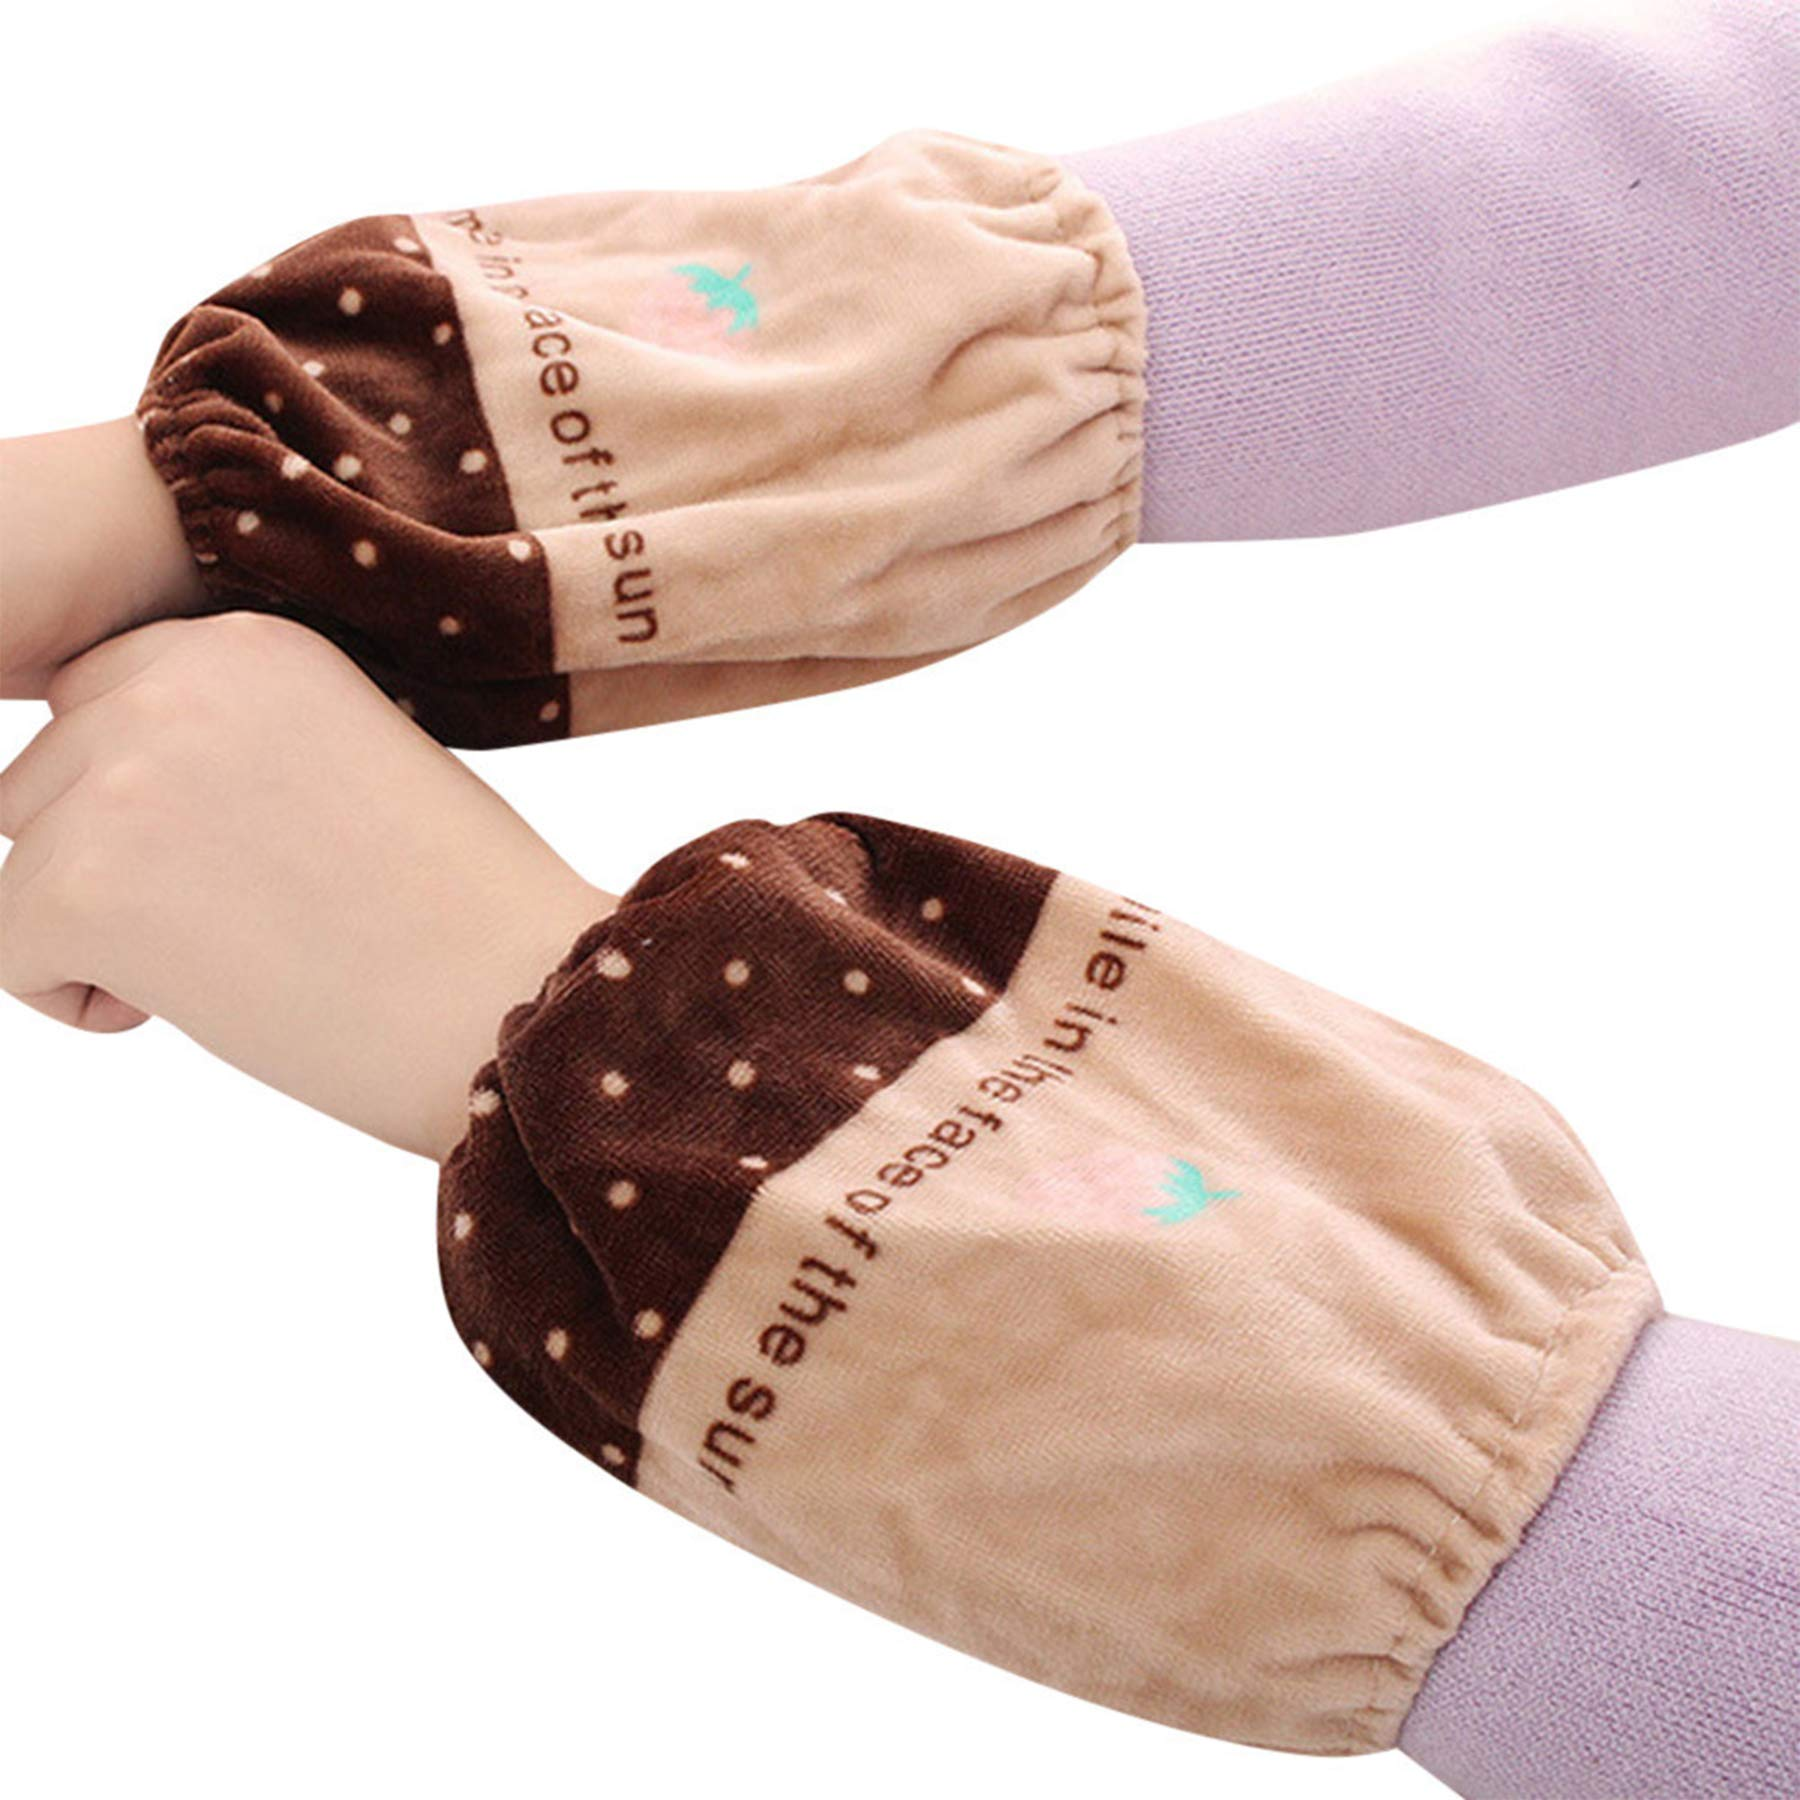 BingYELH Anti-dust Sleeve for Children Oversleeves Arm Sleeves Arm Cover Plush Oversleeves Lovely Cuff Covers